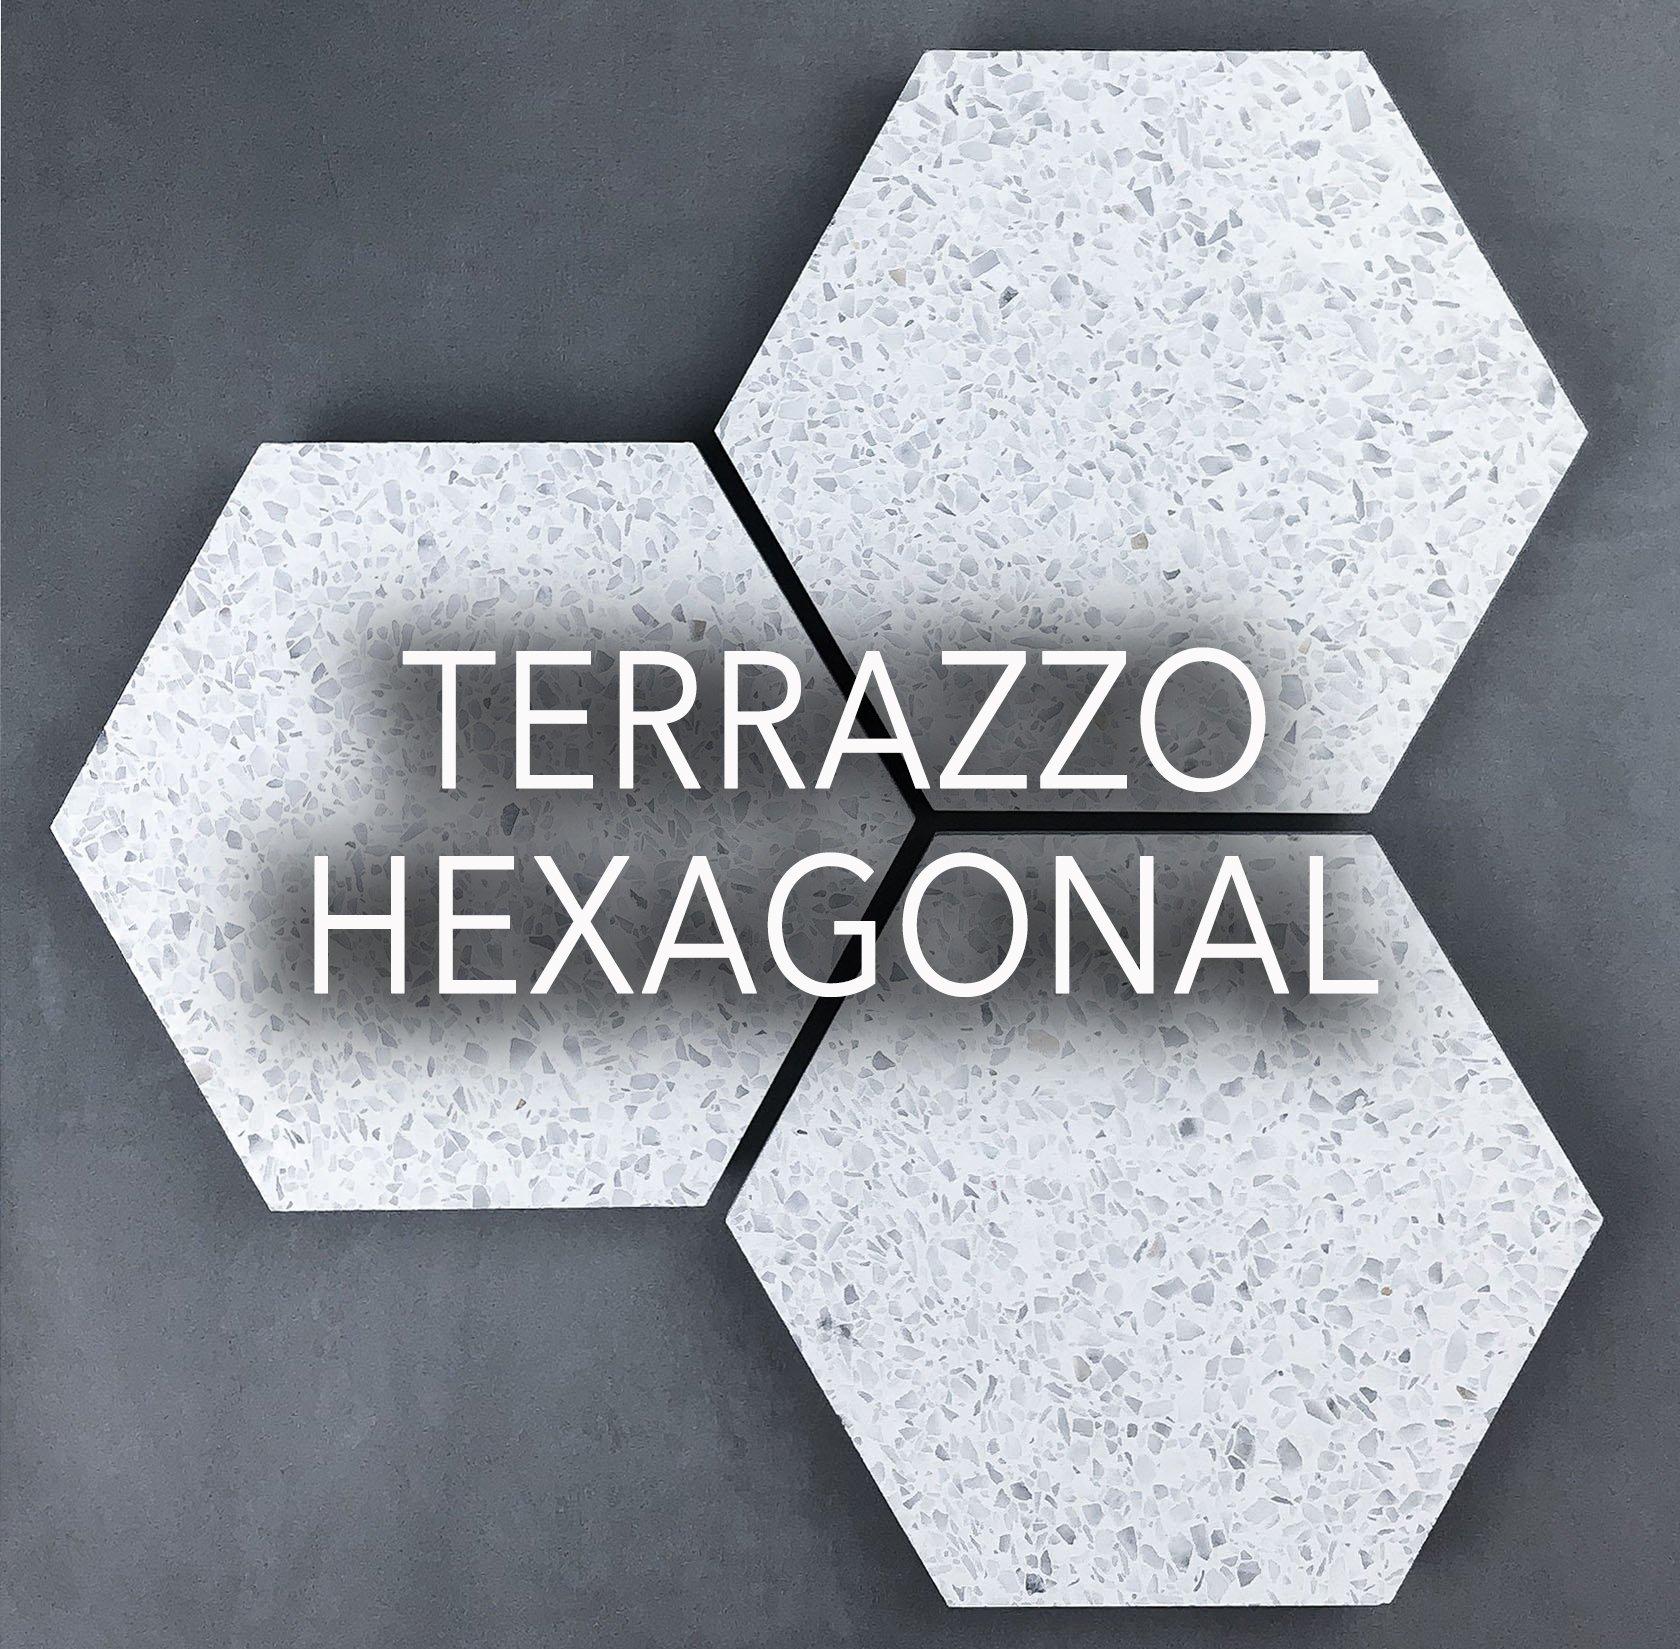 Terrazzo hexagonal